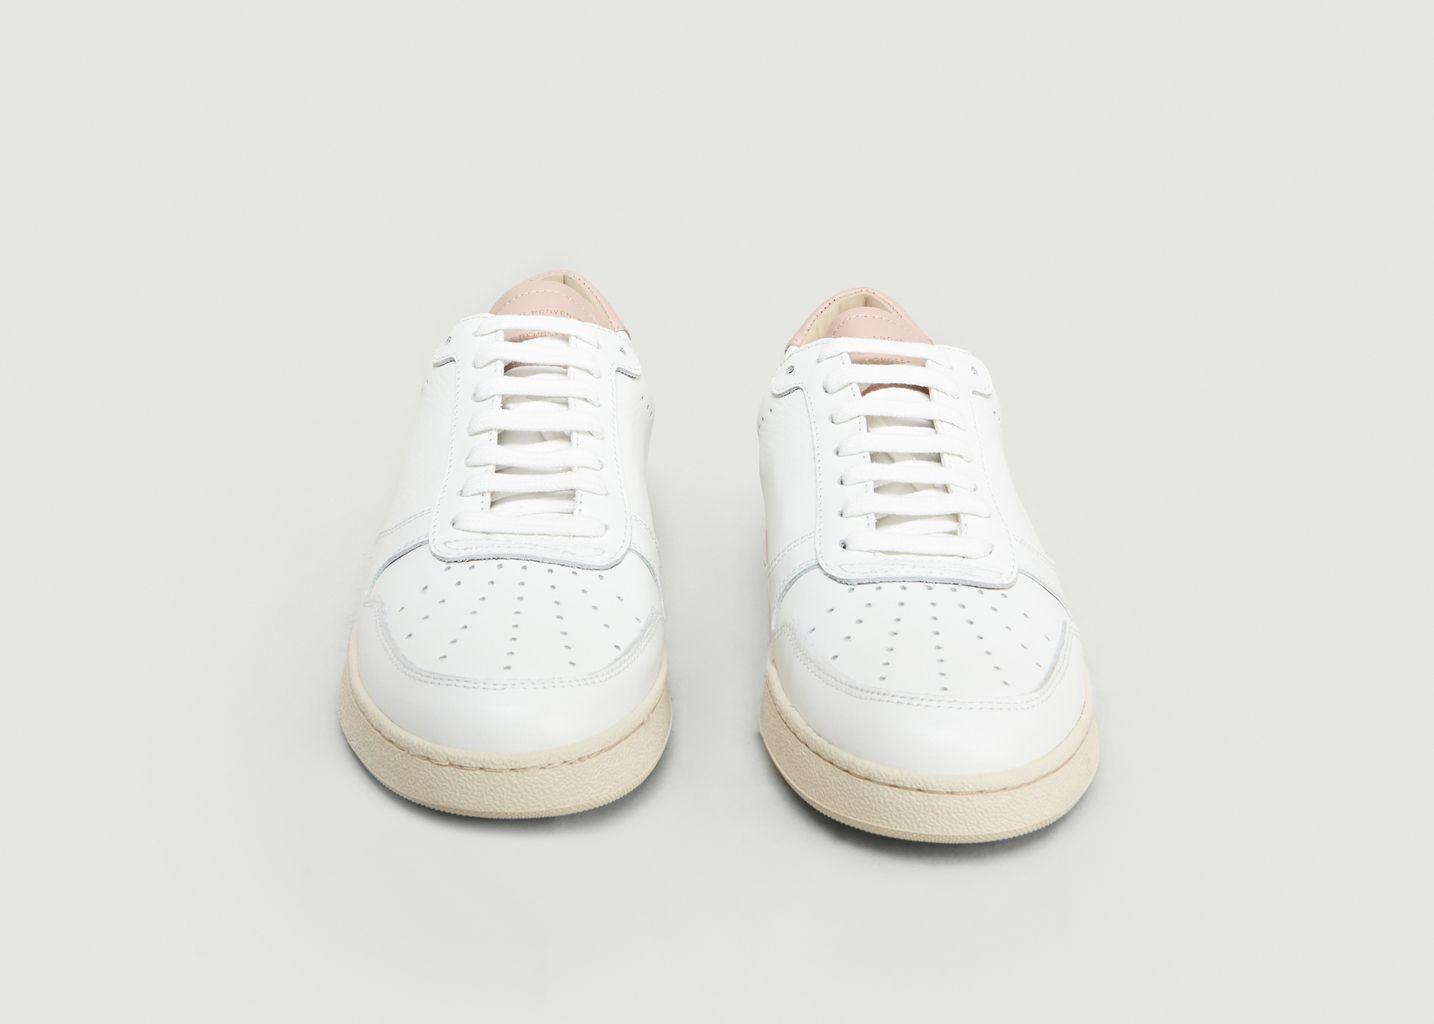 Sneakers Apla Nappa ZSP23 - Zespa